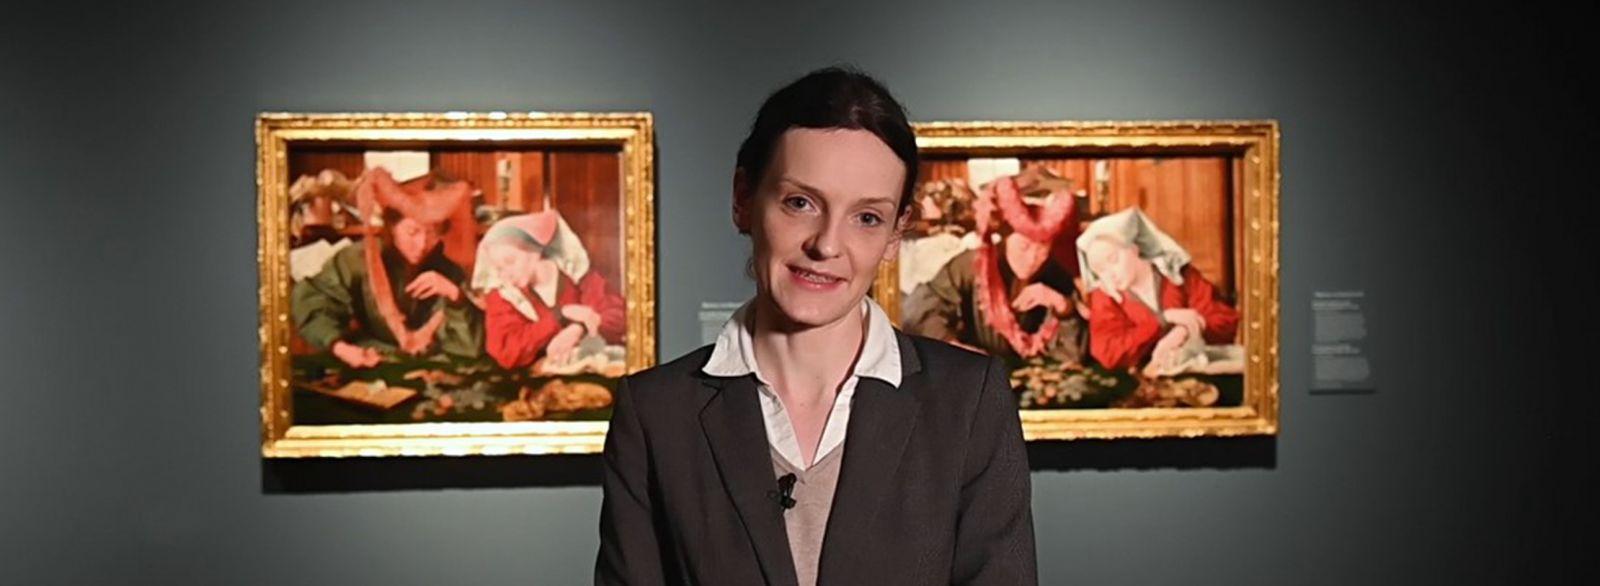 Curator video